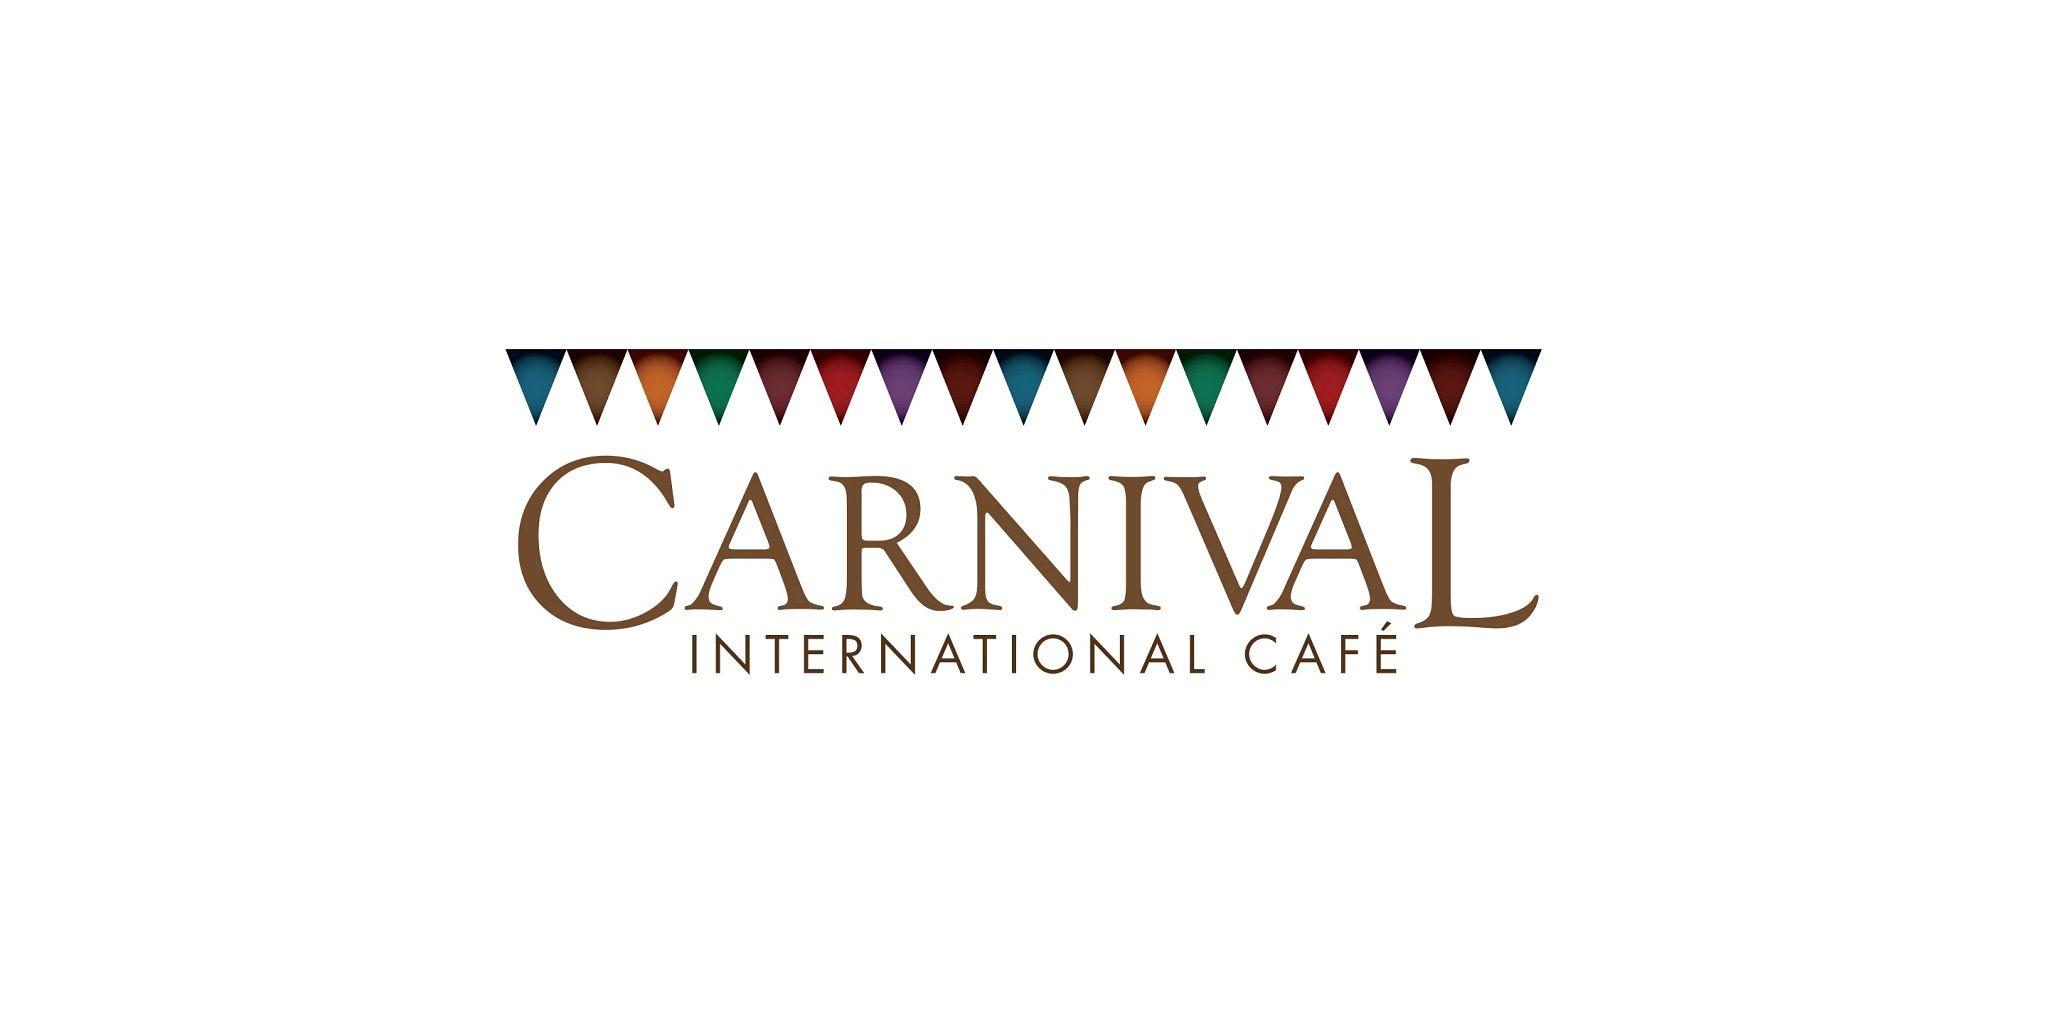 Carnival International Cafe with an international theme buffet